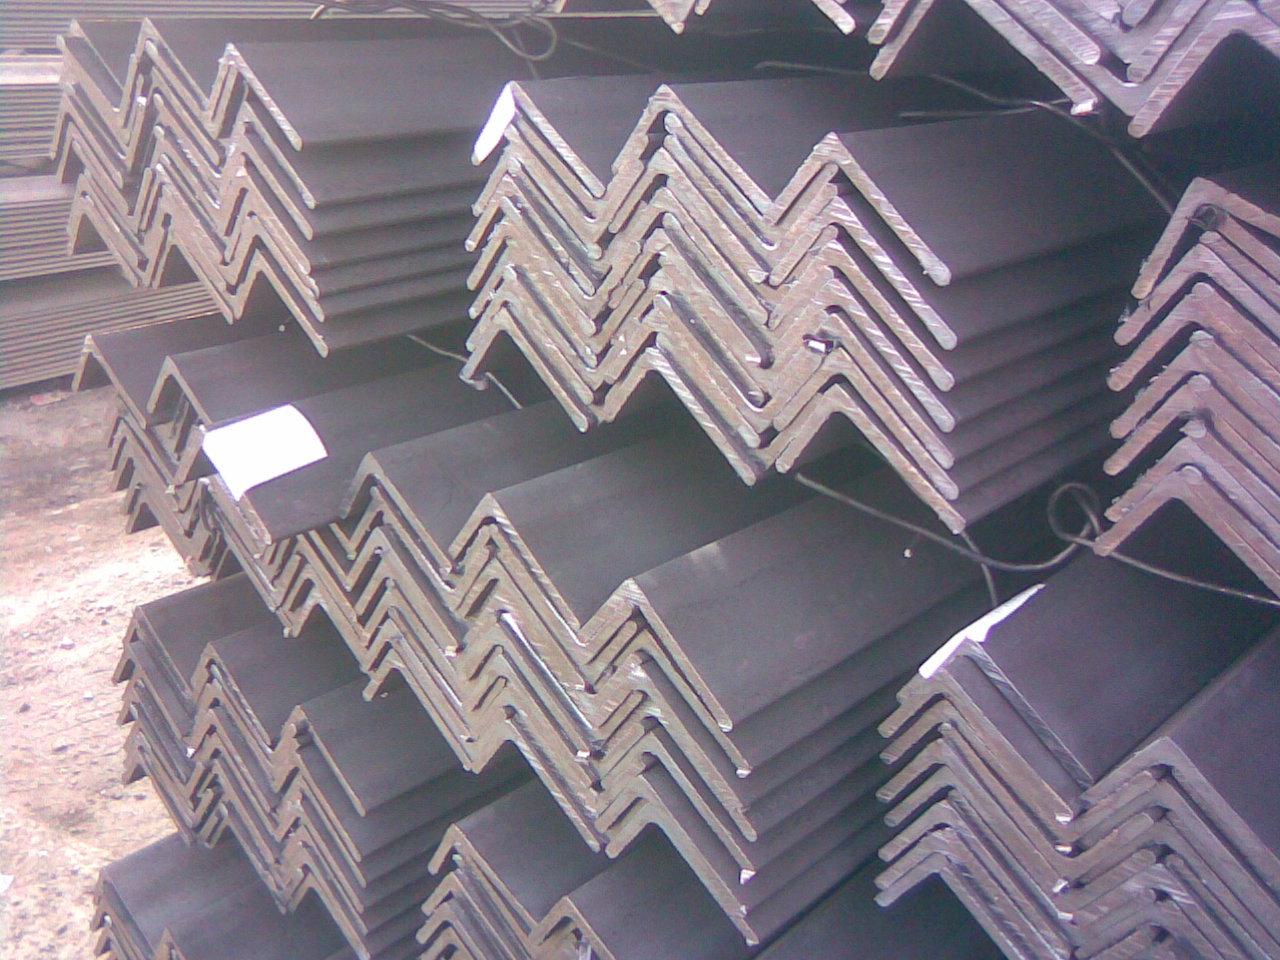 q235钢的屈服强度_角铁型号Q235B是什么意思-求助角铁规格